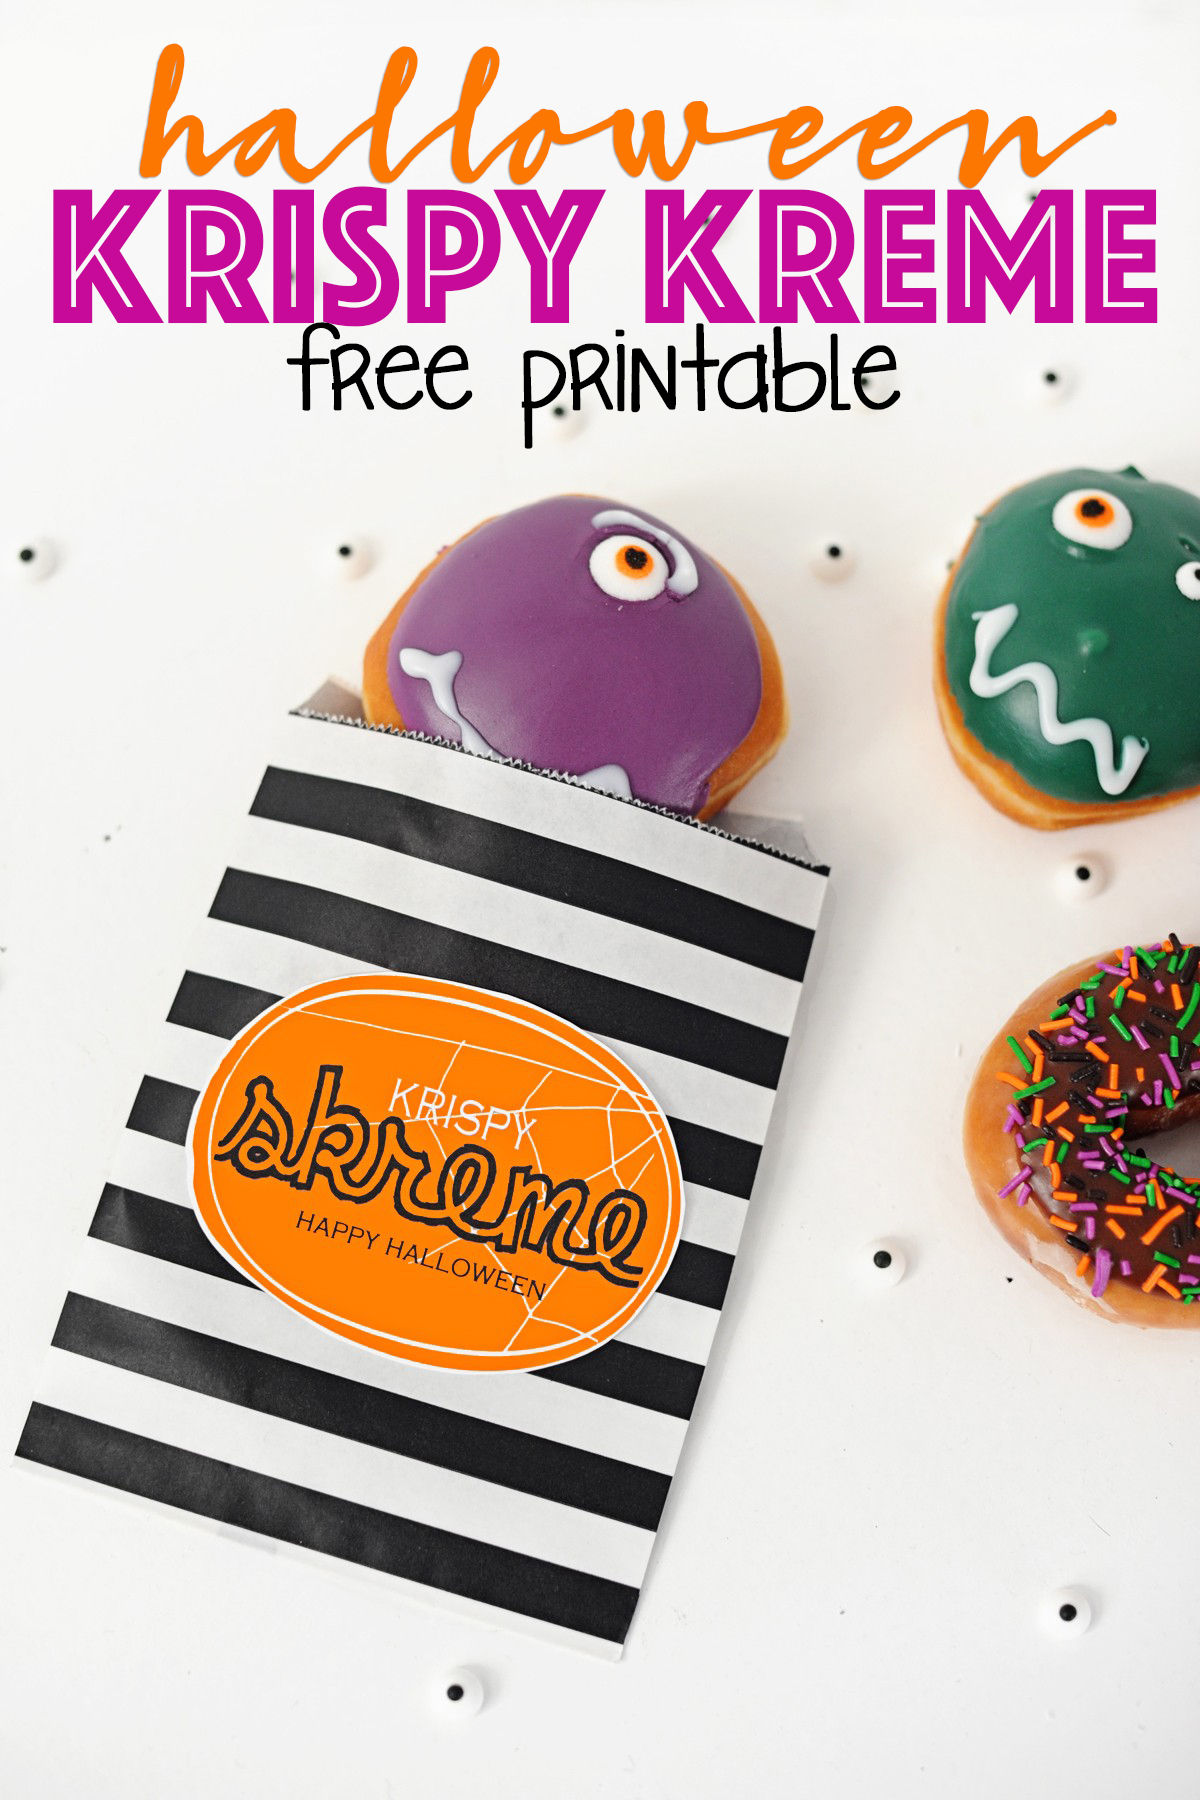 Free Halloween Printable : I Scream, You Scream, We all Scream for Krispy sKreme